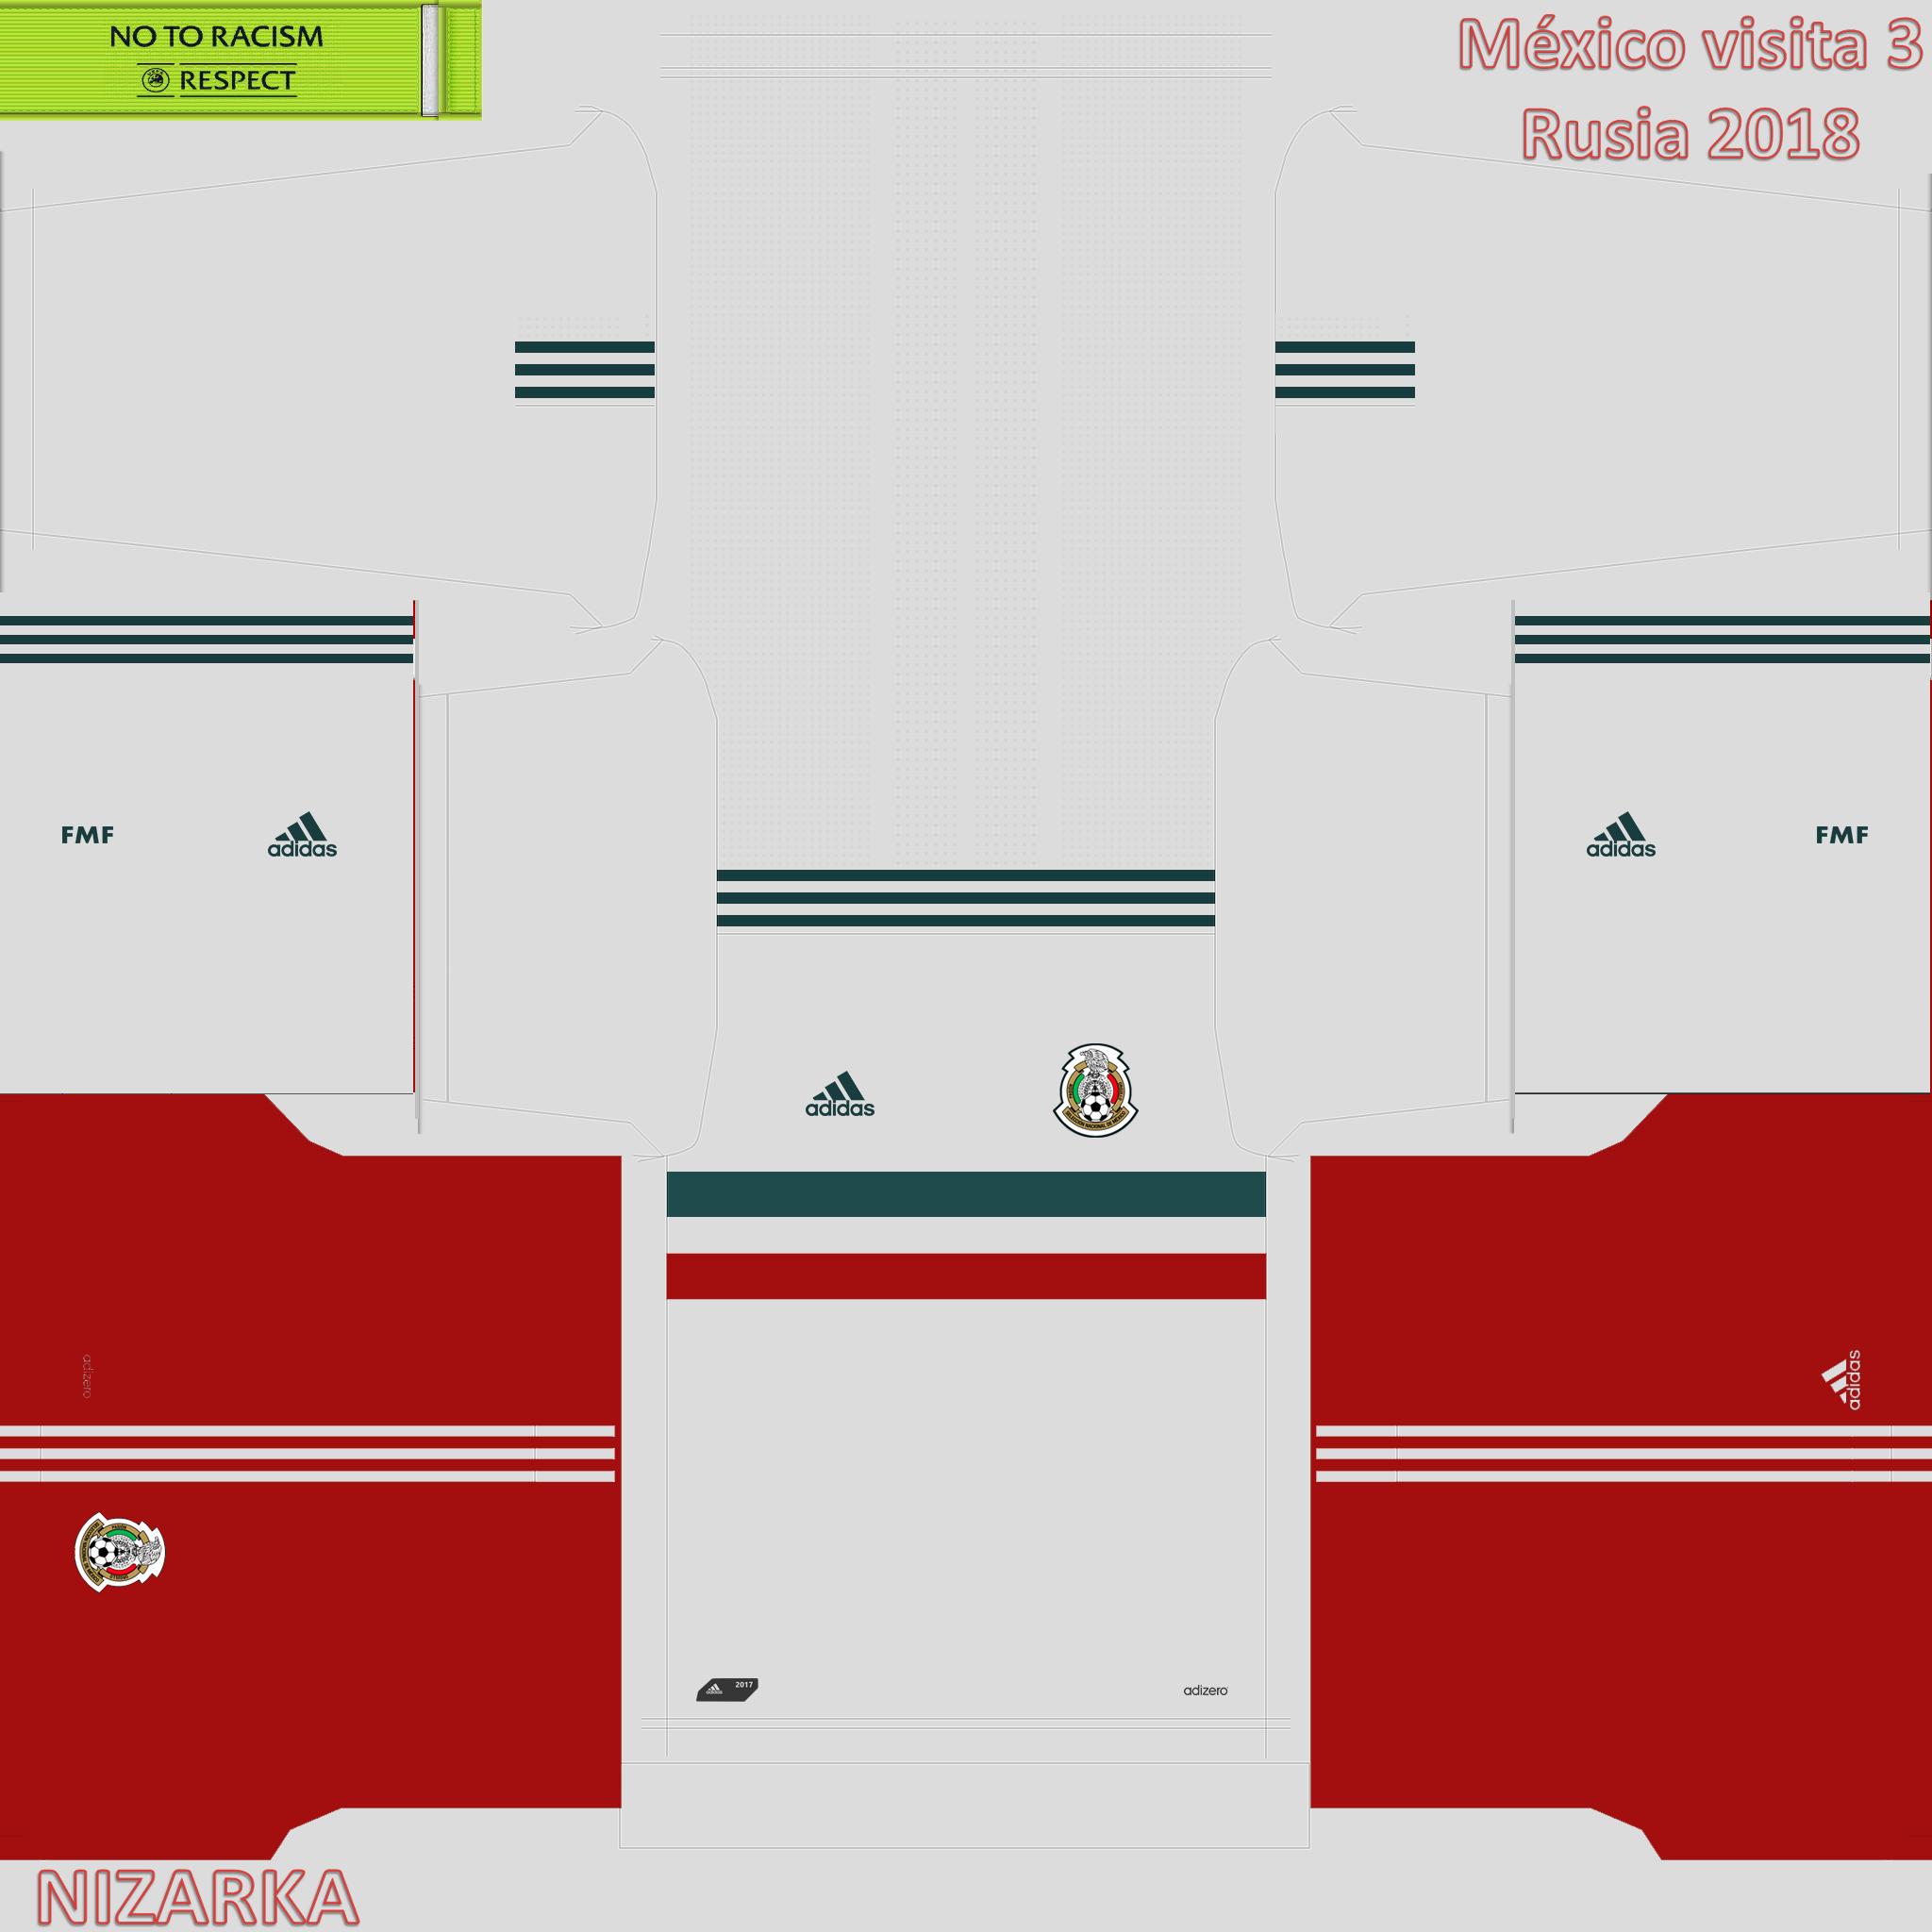 Uniforme Mexico visita 3 pes 2018 rusia 2018.